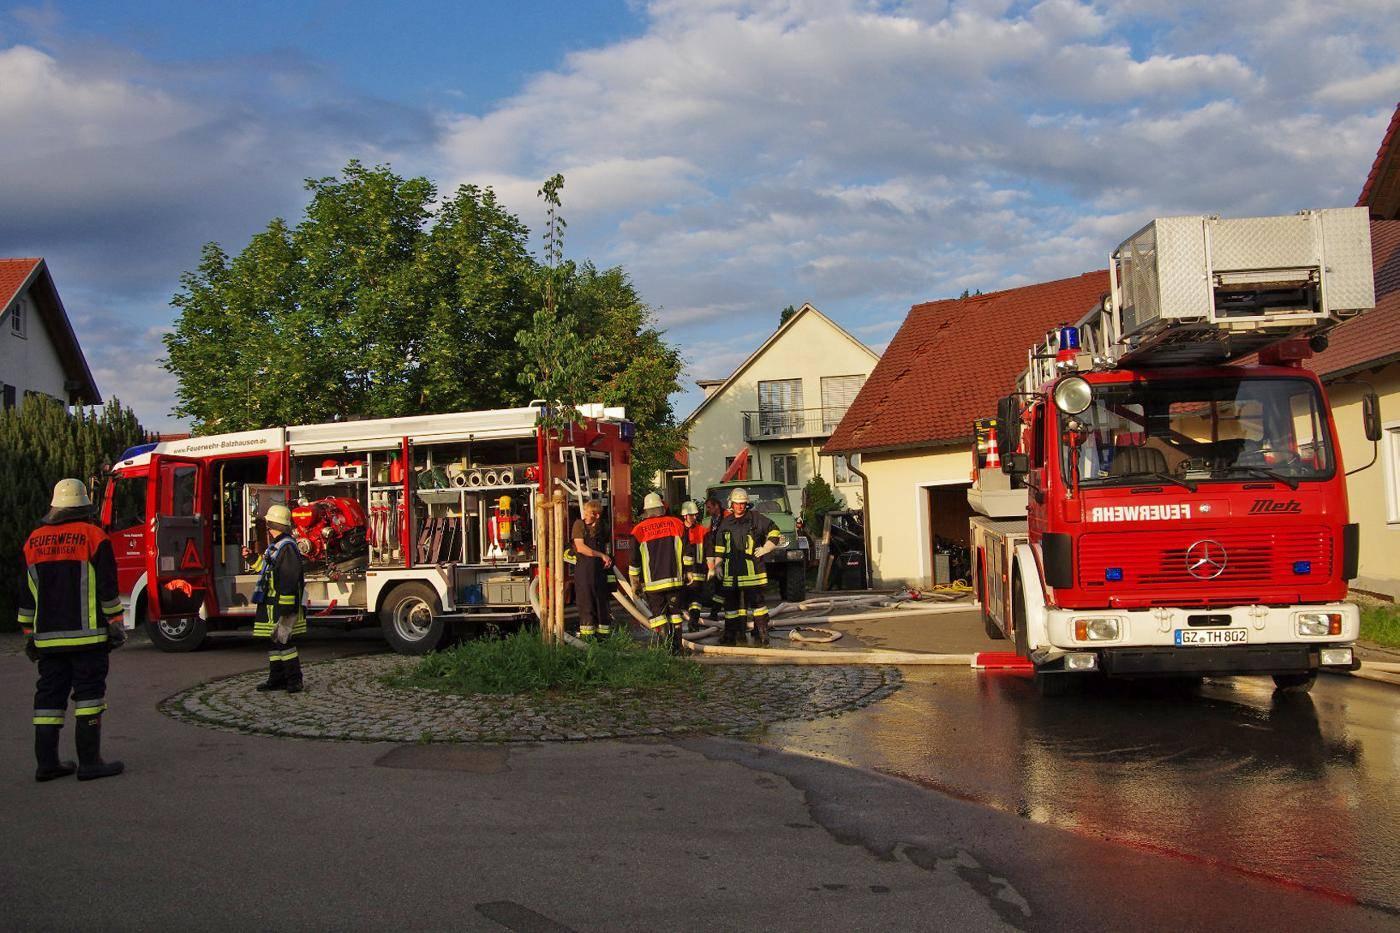 Brand Balzhausen, Feuerwehr, Bsaktuell, Weiss, Obeser